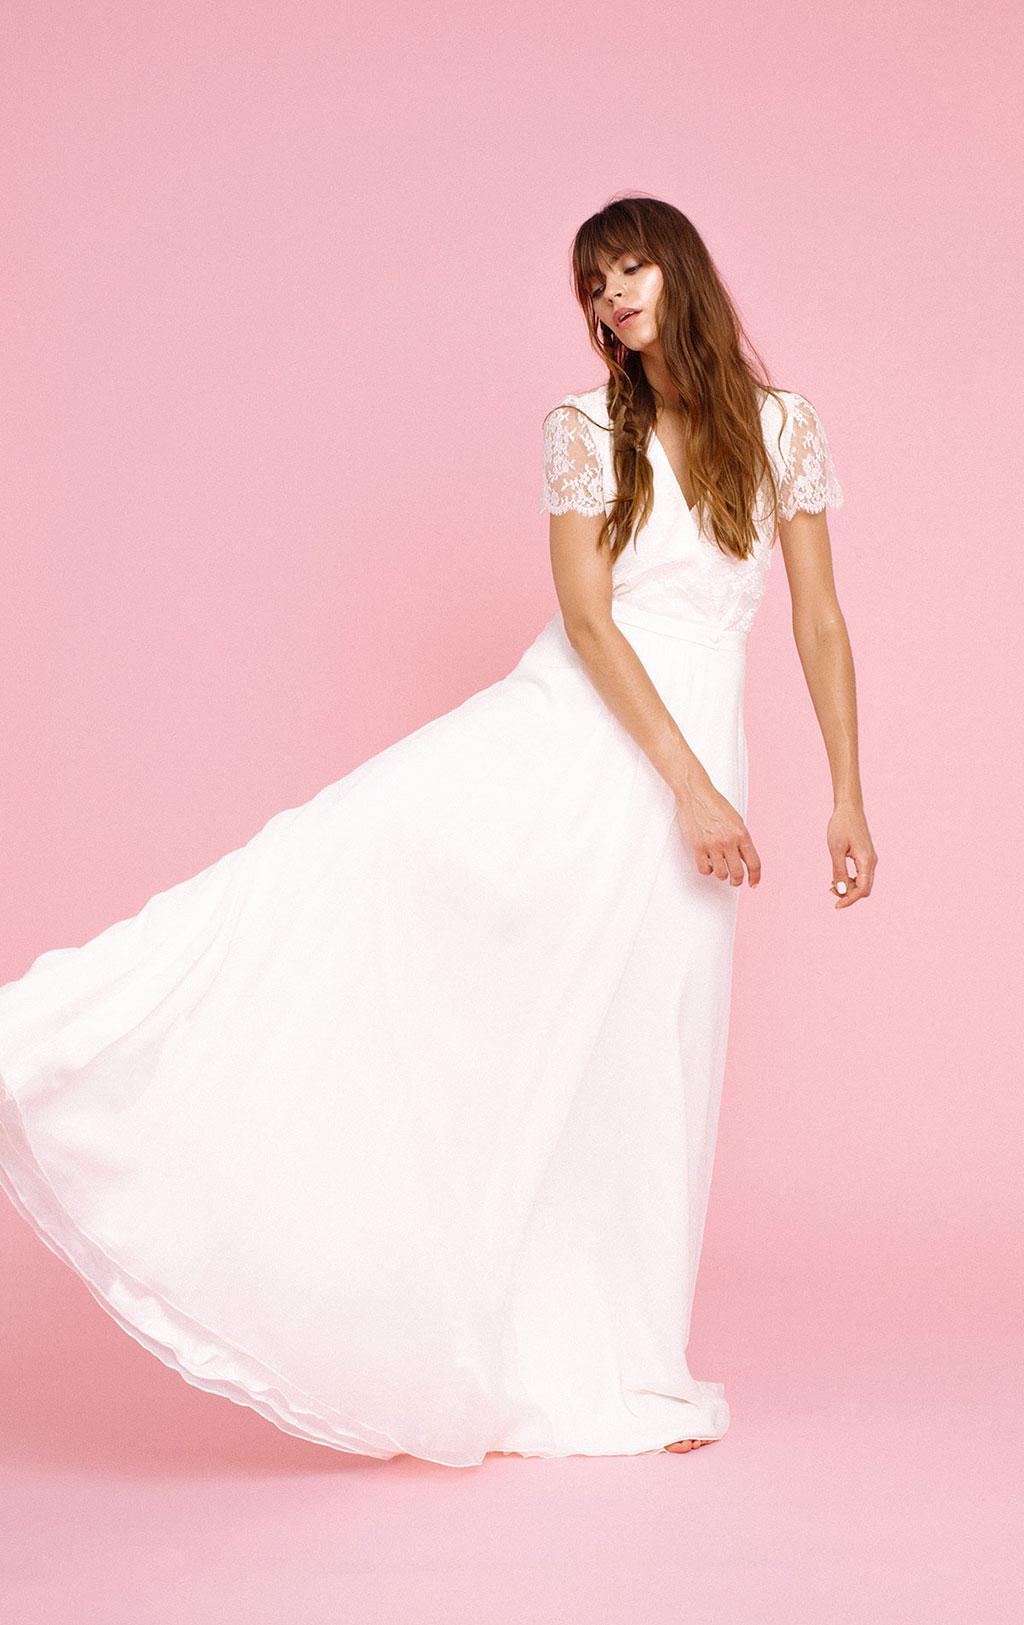 elise-hameau-robes-de-mariee-mariage-wedding-dresses-couture-bridal_collection-permanente_002.jpg